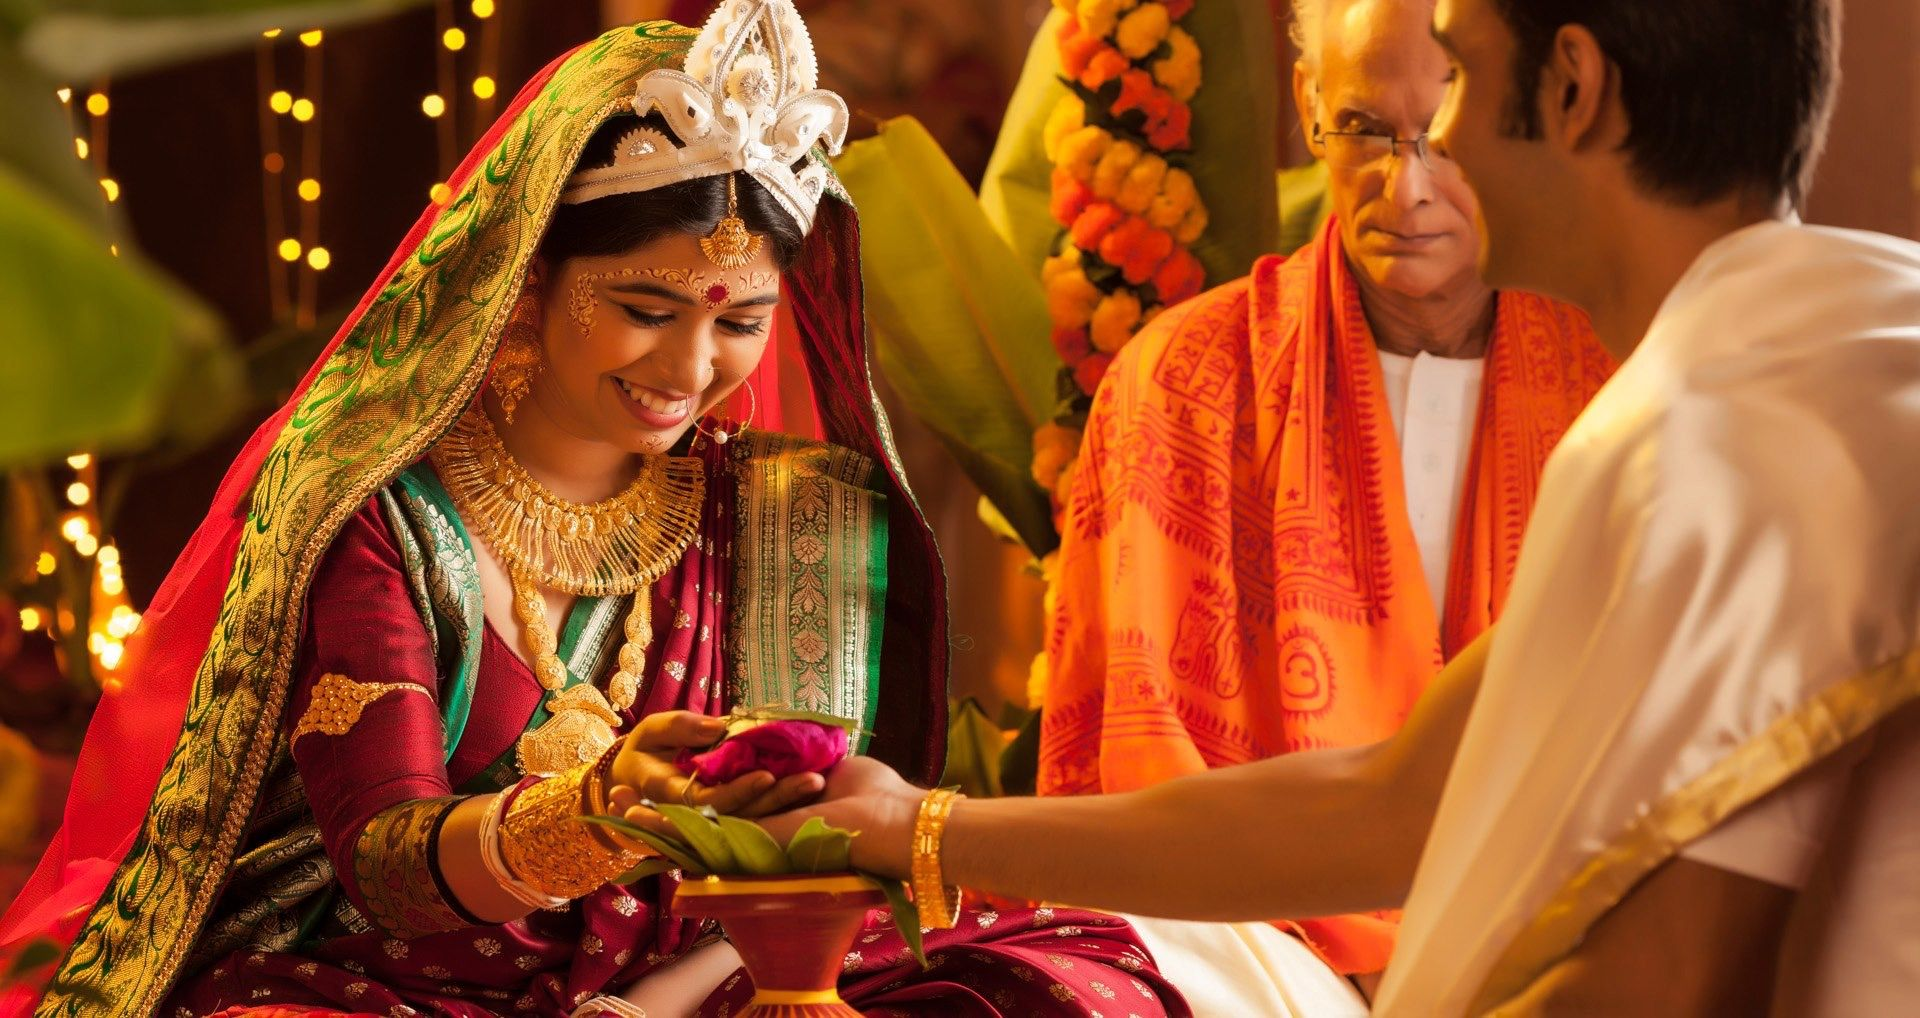 Pin by Aniruddha Chakladar on Bengali bride Bengali